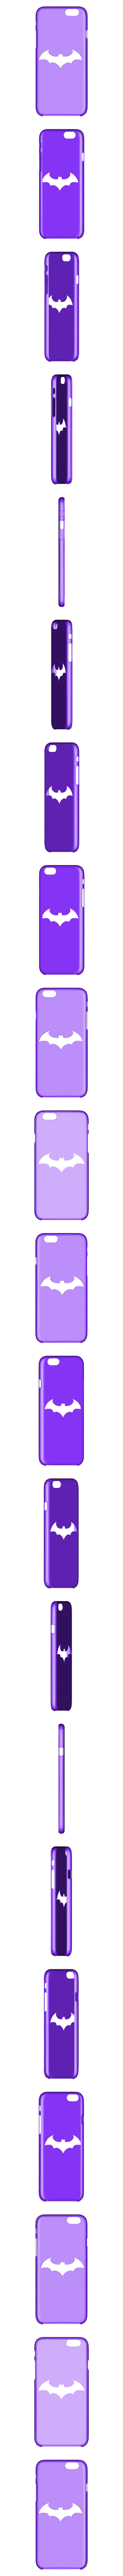 iPhone 6S Batman Case.stl Download STL file iPhone 6S Batman Case • Object to 3D print, eMBe85